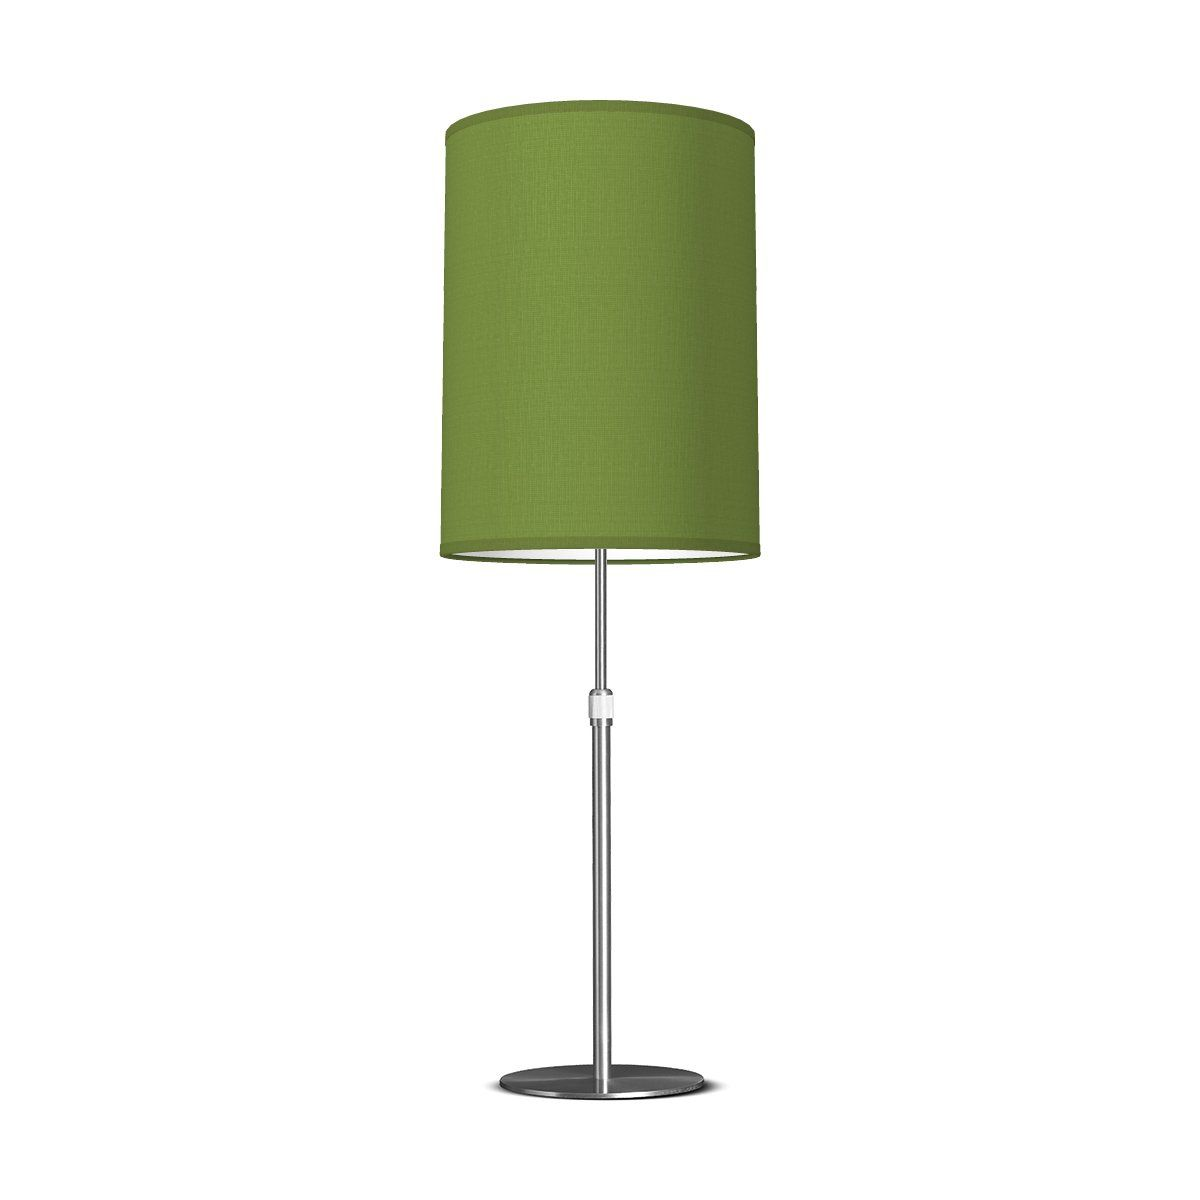 tafellamp zozo tube Ø 25 cm - groen